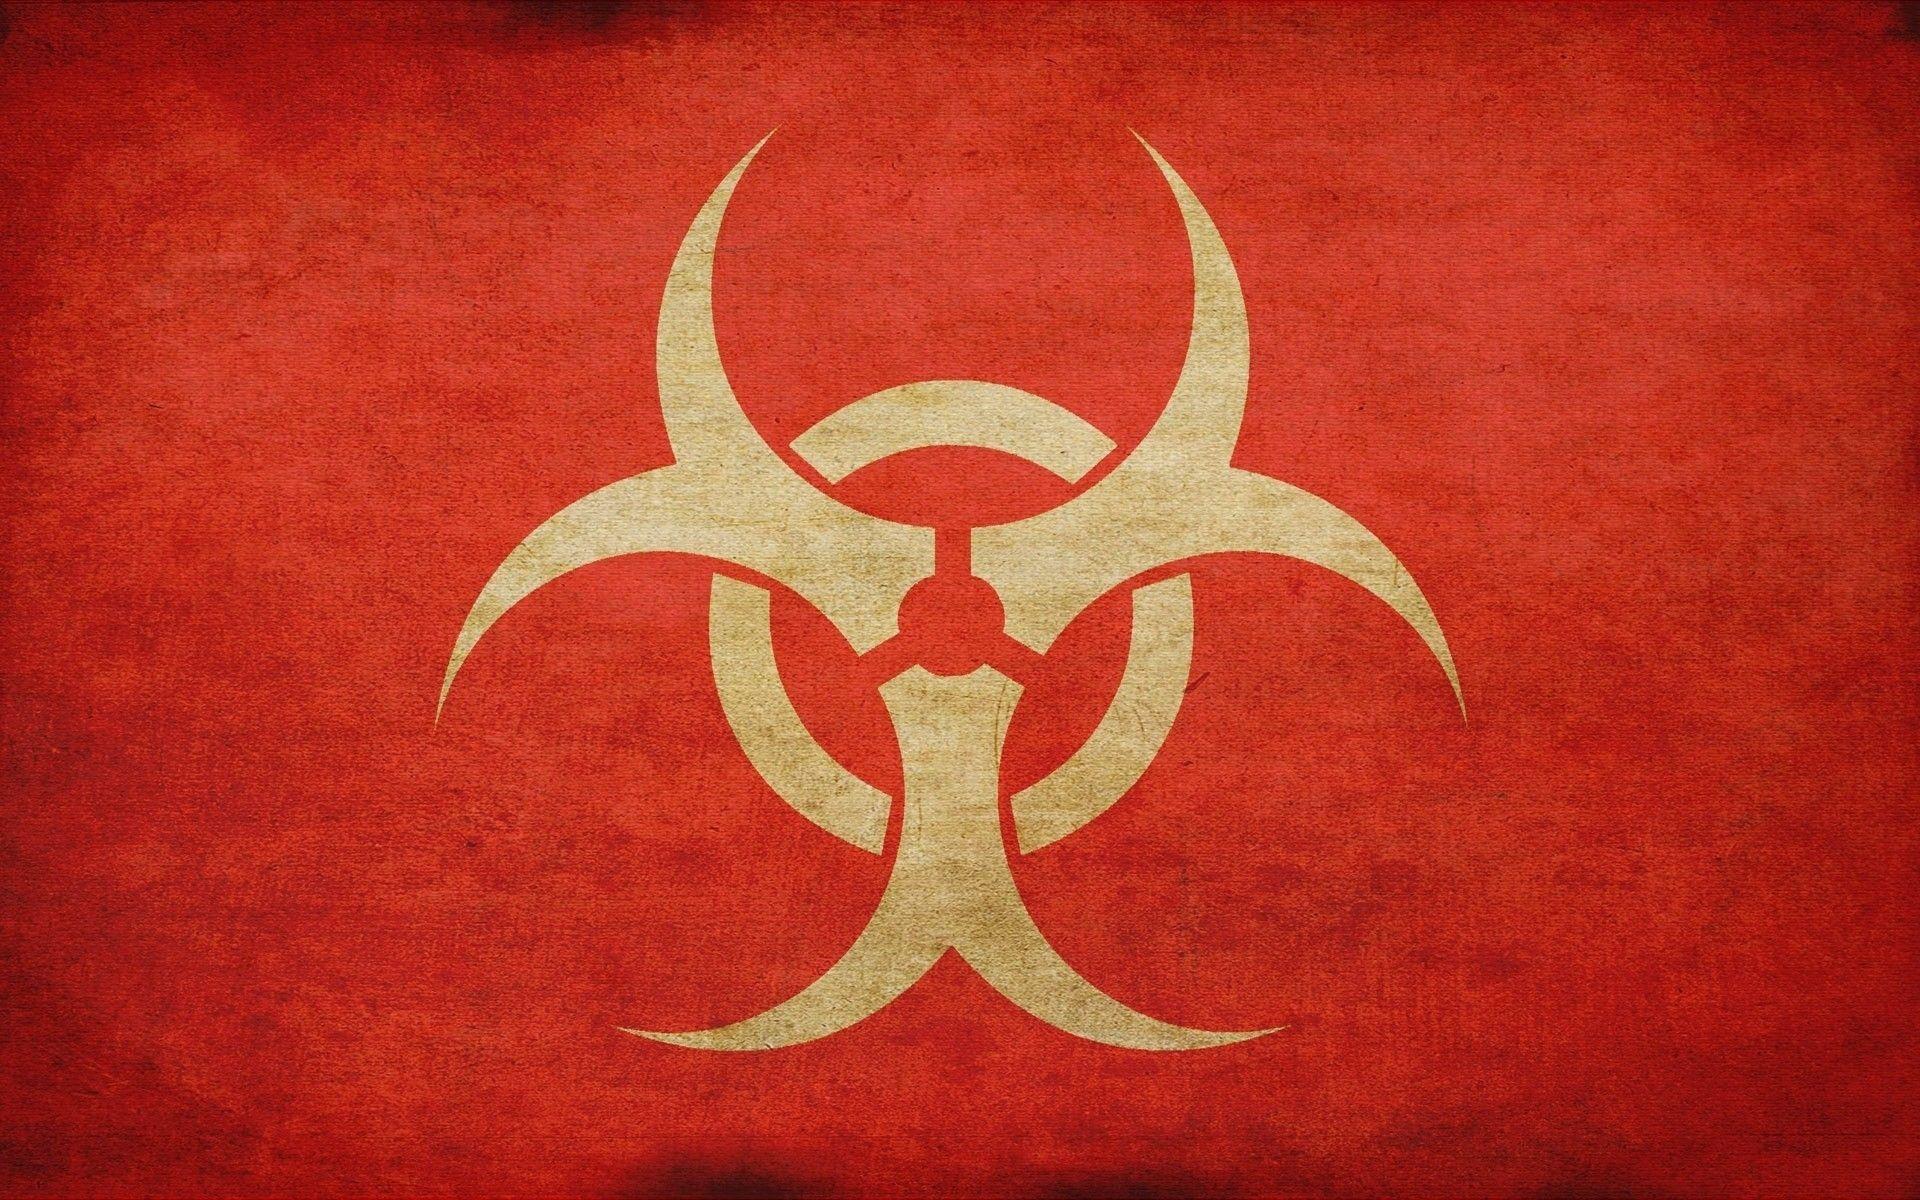 Radioactive Wallpaper  Pinterest High quality